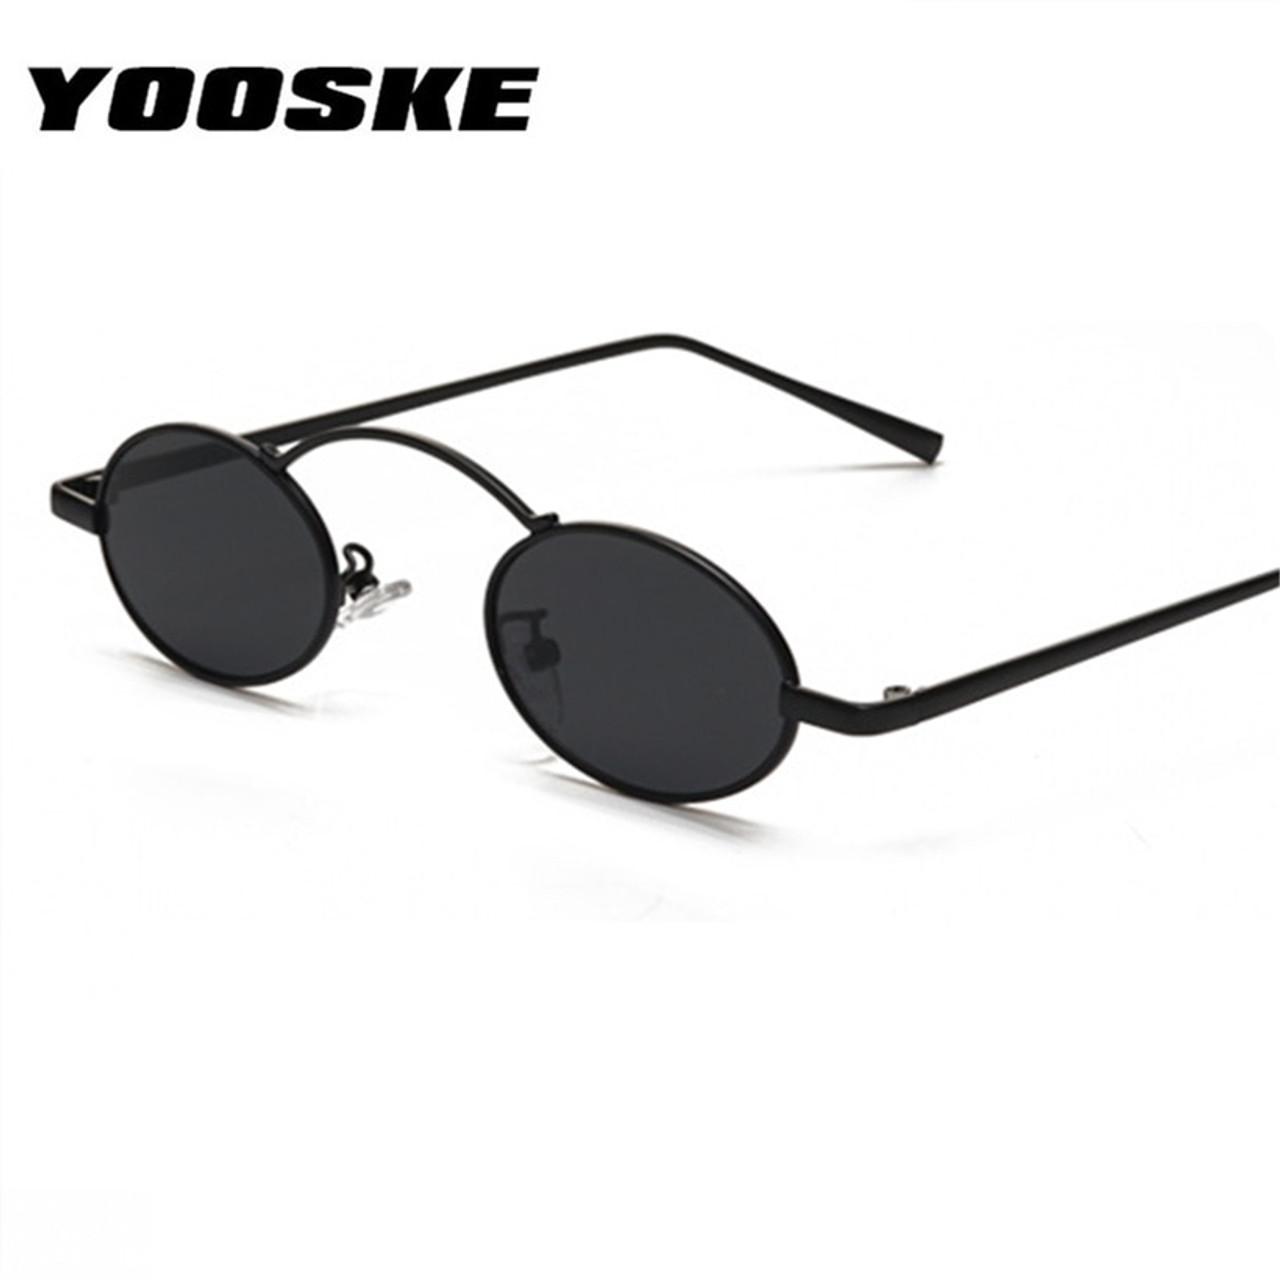 5507f339b180 YOOSKE Women Men Sunglasses Round Metal Frame Brand Designer Mirror  Eyewears Retro Females Male Sun Glasses ...